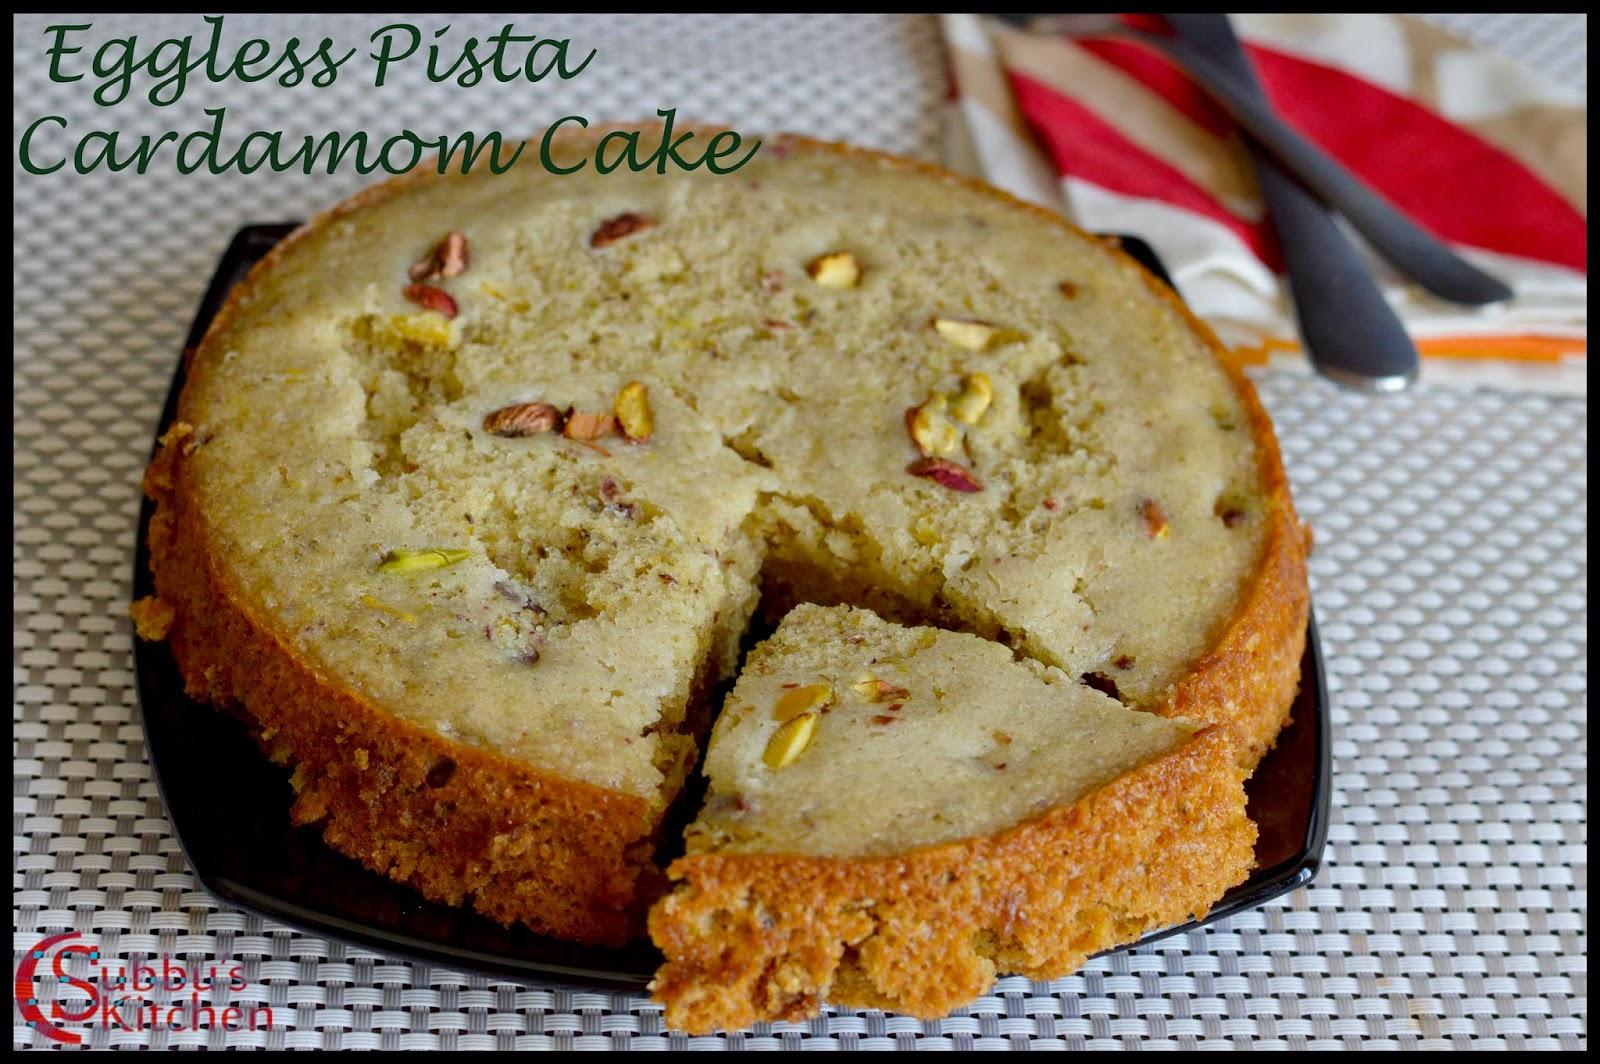 Eggless Pistachio Cardamom Cake Recipe (Pressure Cooker Method)